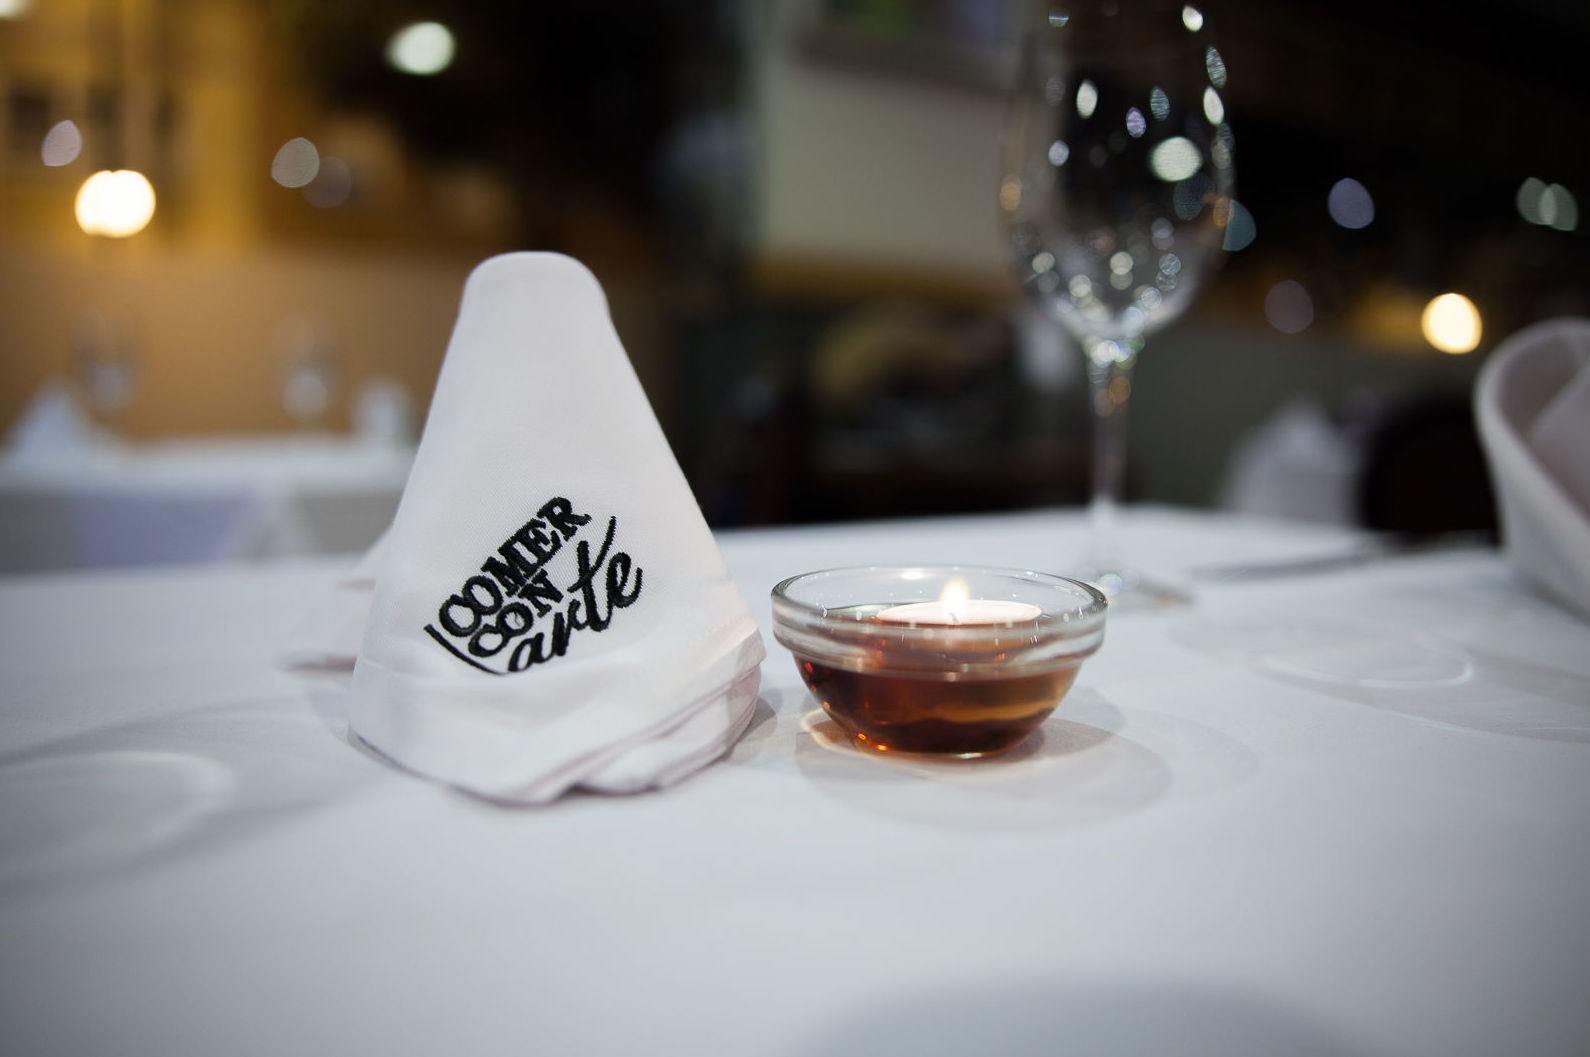 Foto 10 de Cocina tradicional en Sevilla | Comer con Arte